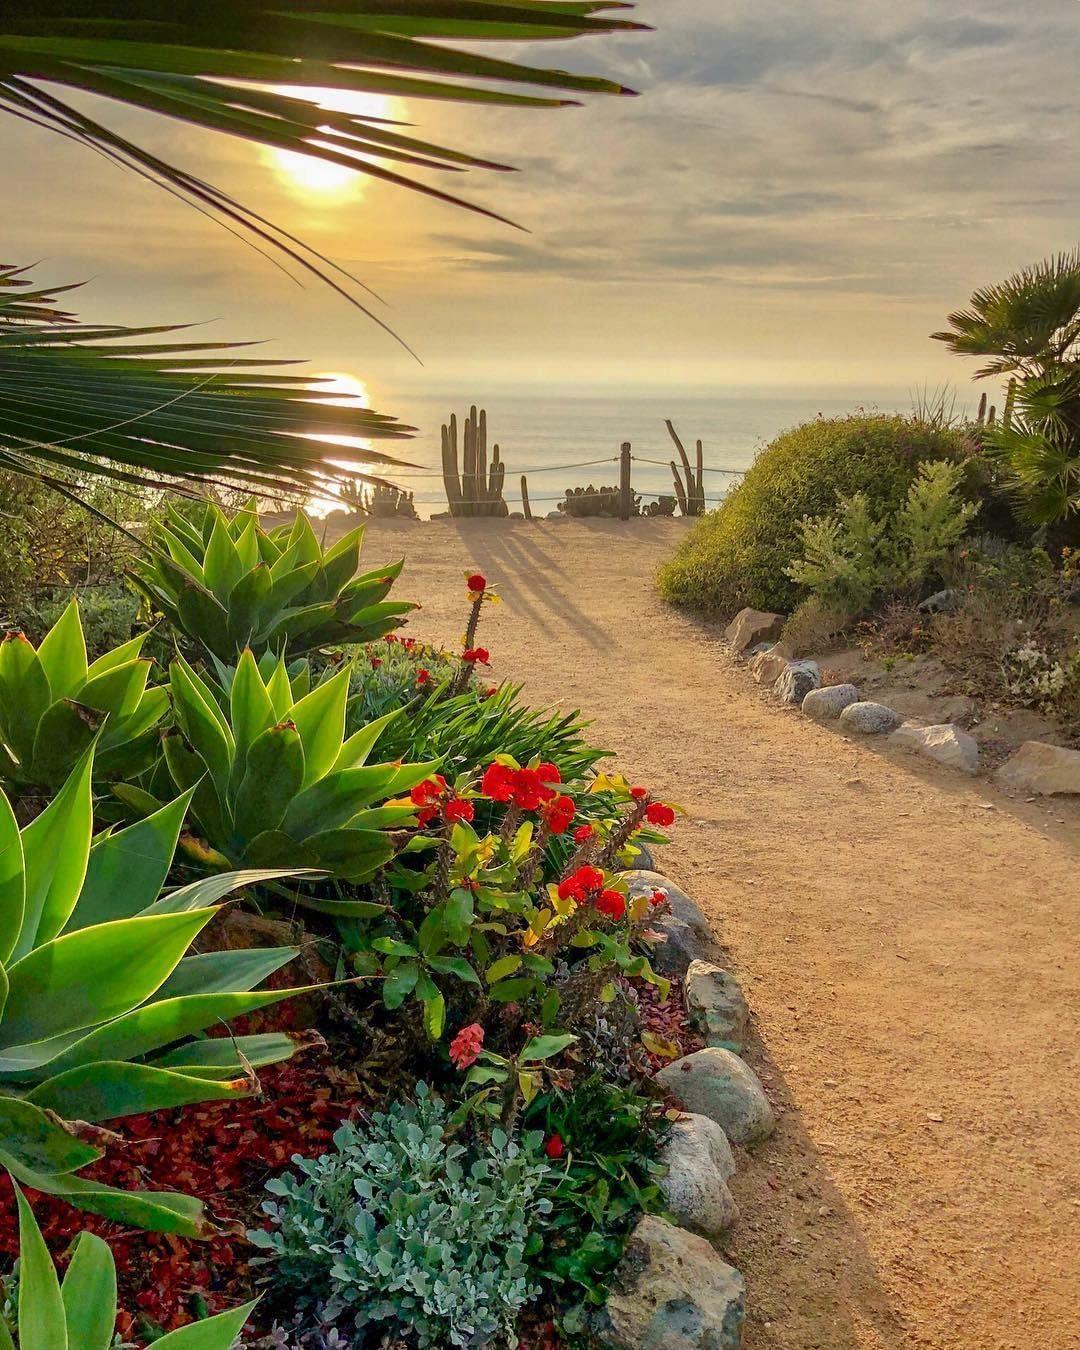 b8ef2c14083f3ab73803702557d8dfd1 - Self Realization Fellowship Meditation Gardens Encinitas